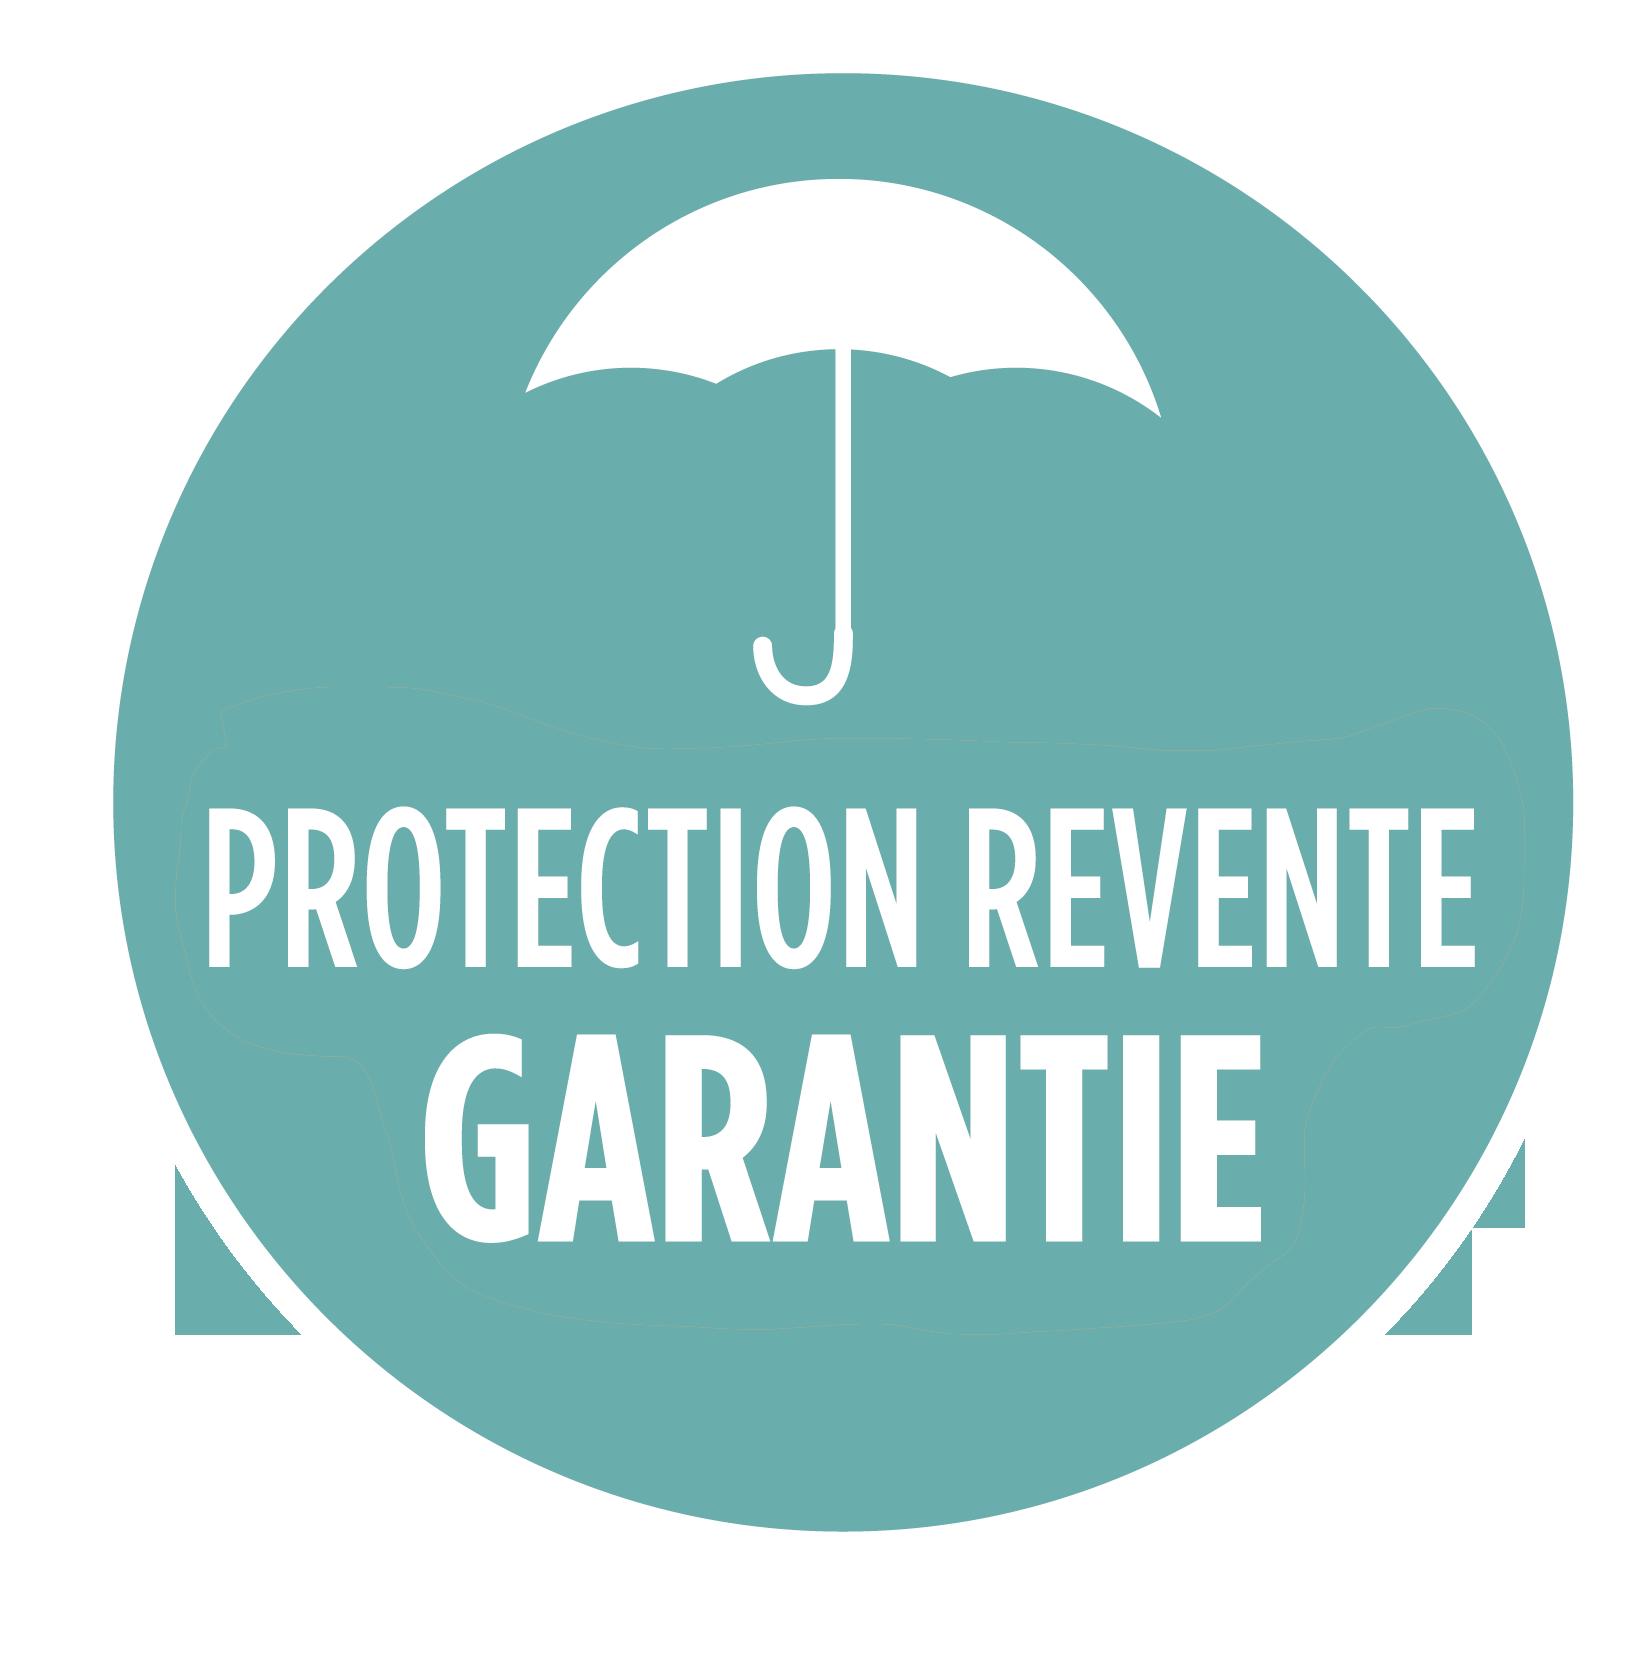 Agence immobilière Guy Hoquet Lisieux - Protection revente